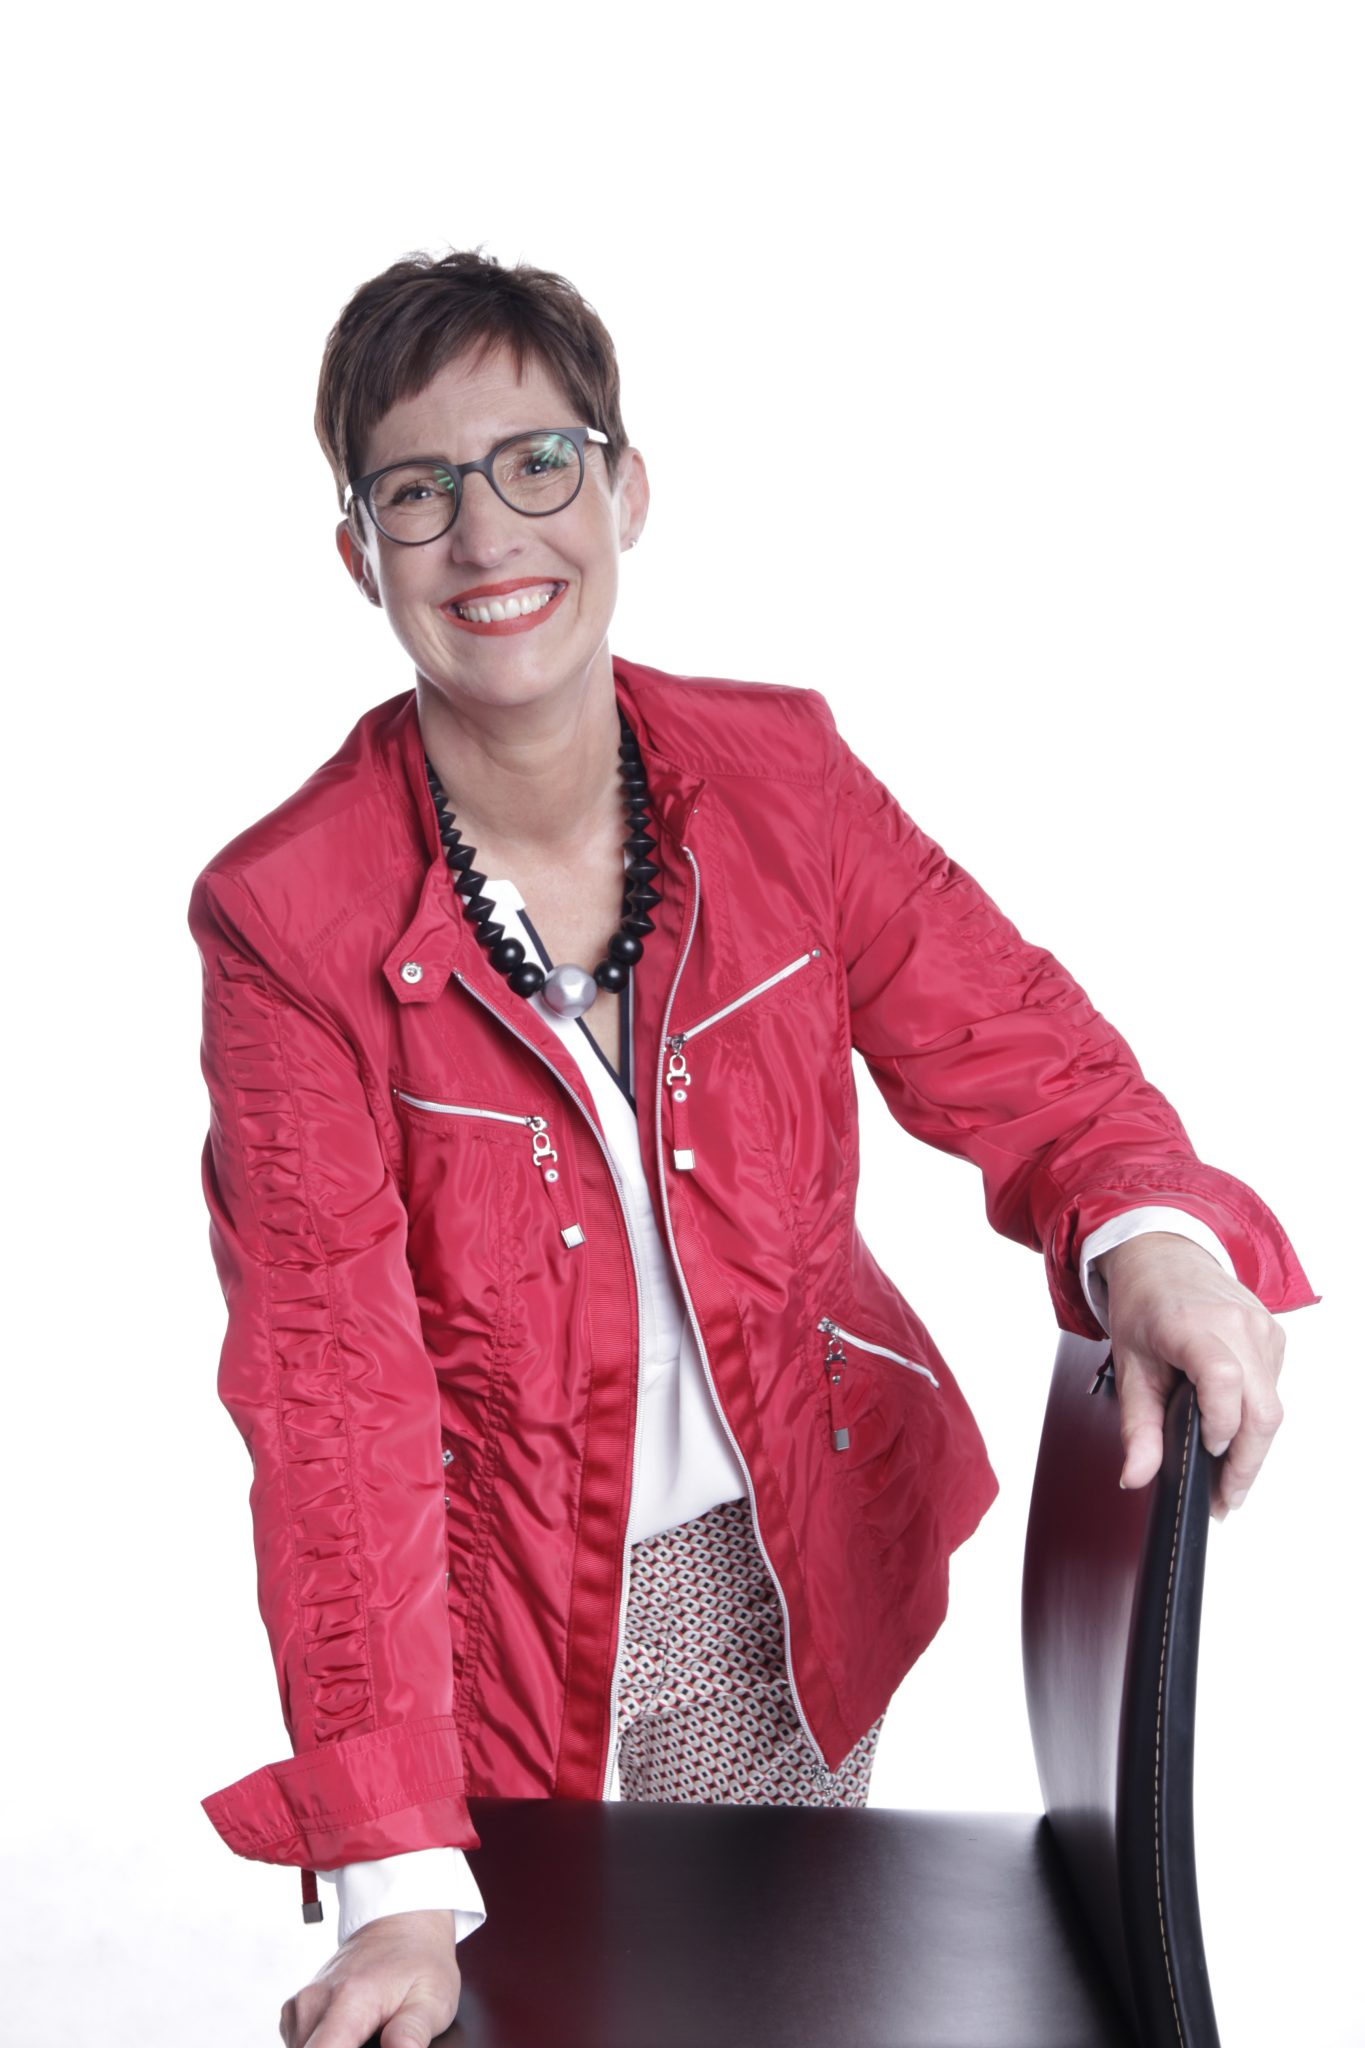 Frau post mit Stuhl in roter Jacke